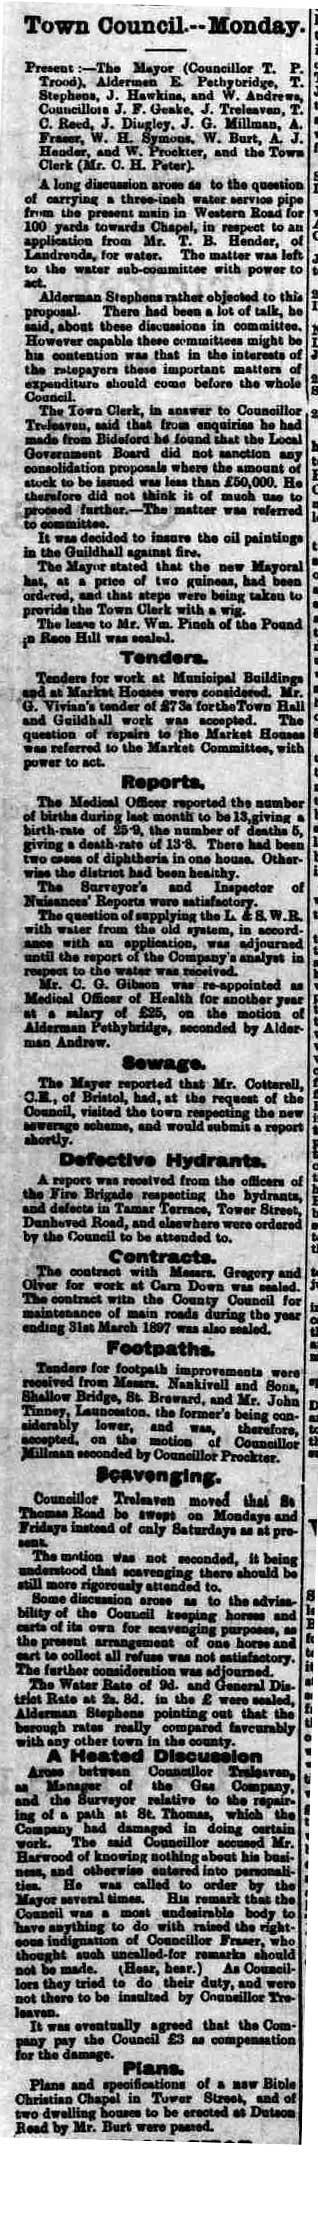 13 June 1896